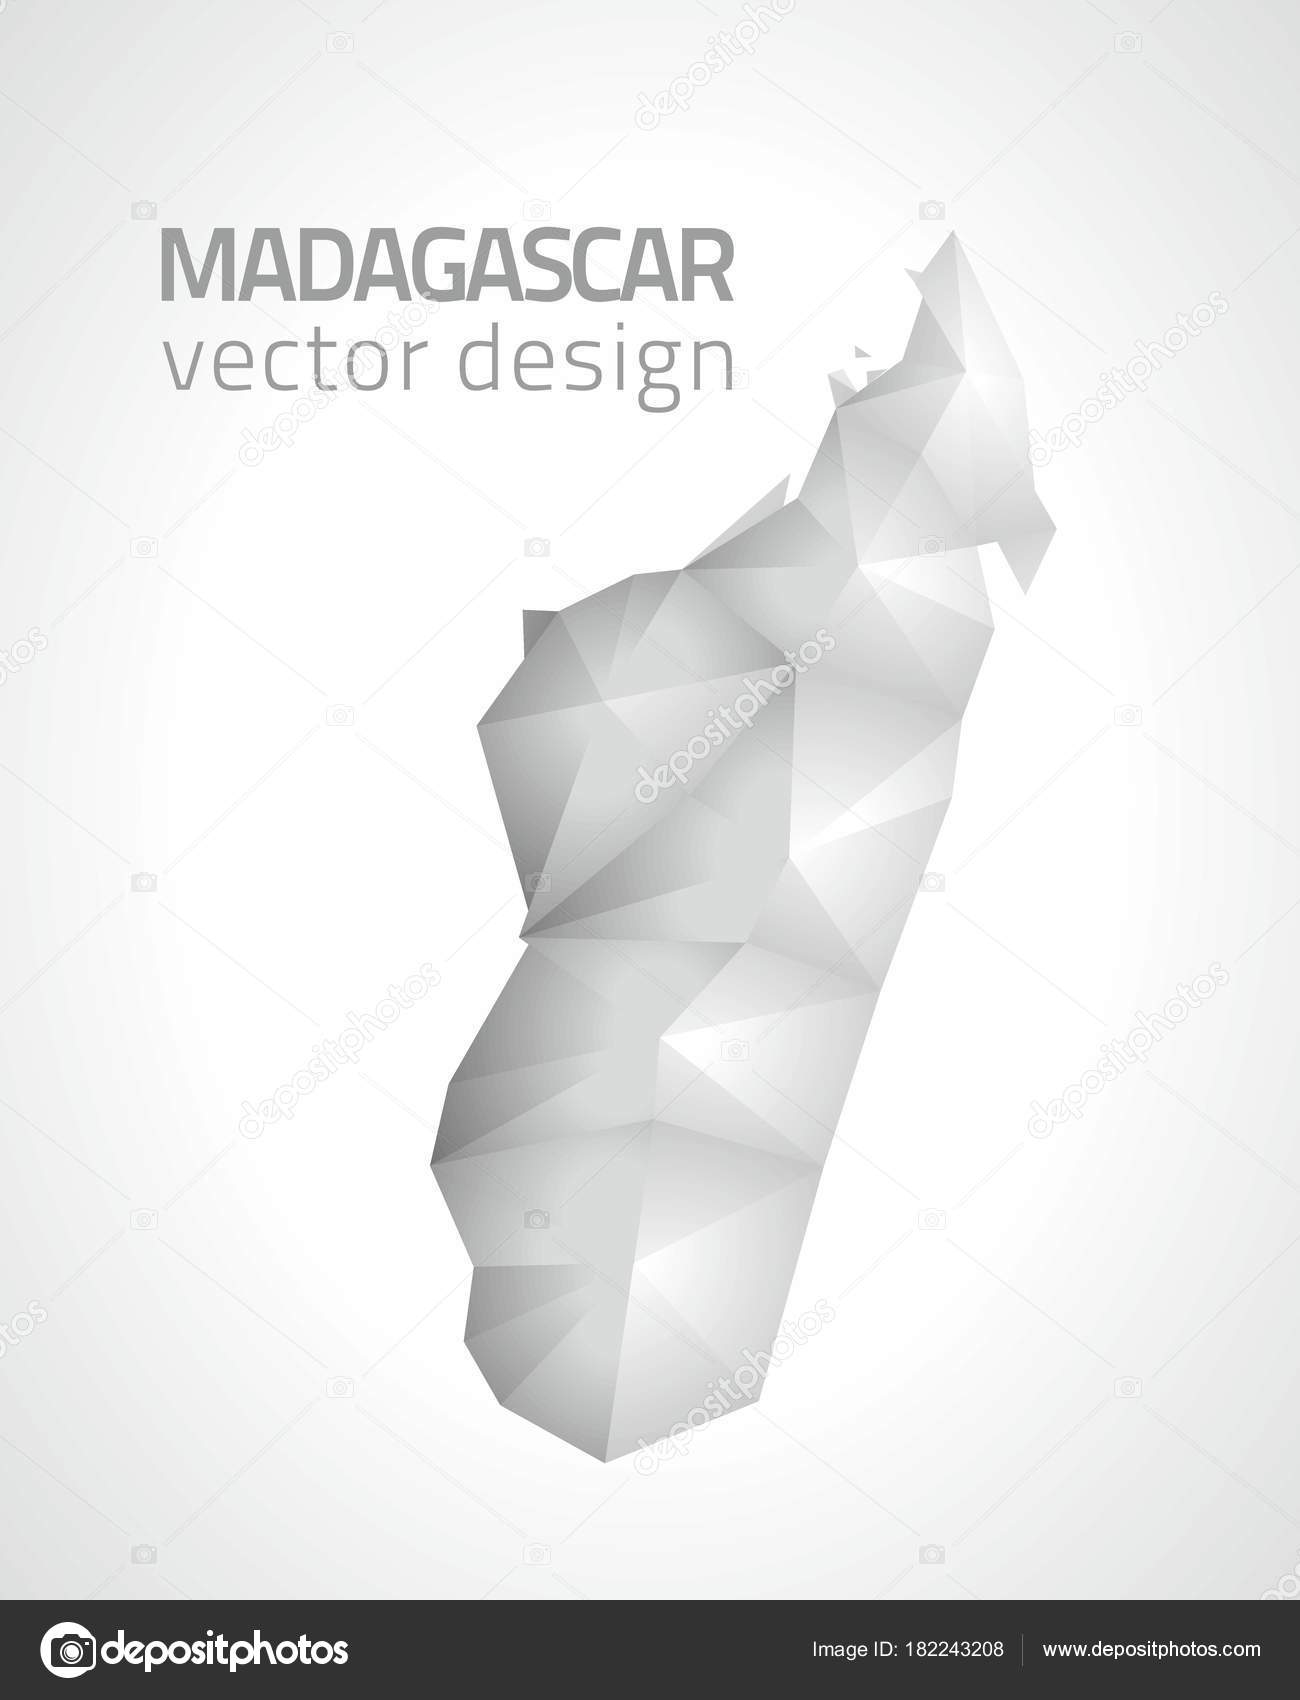 Carte Grise Madagascar.Madagascar Polygonale Vector Carte Grise Argentee Image